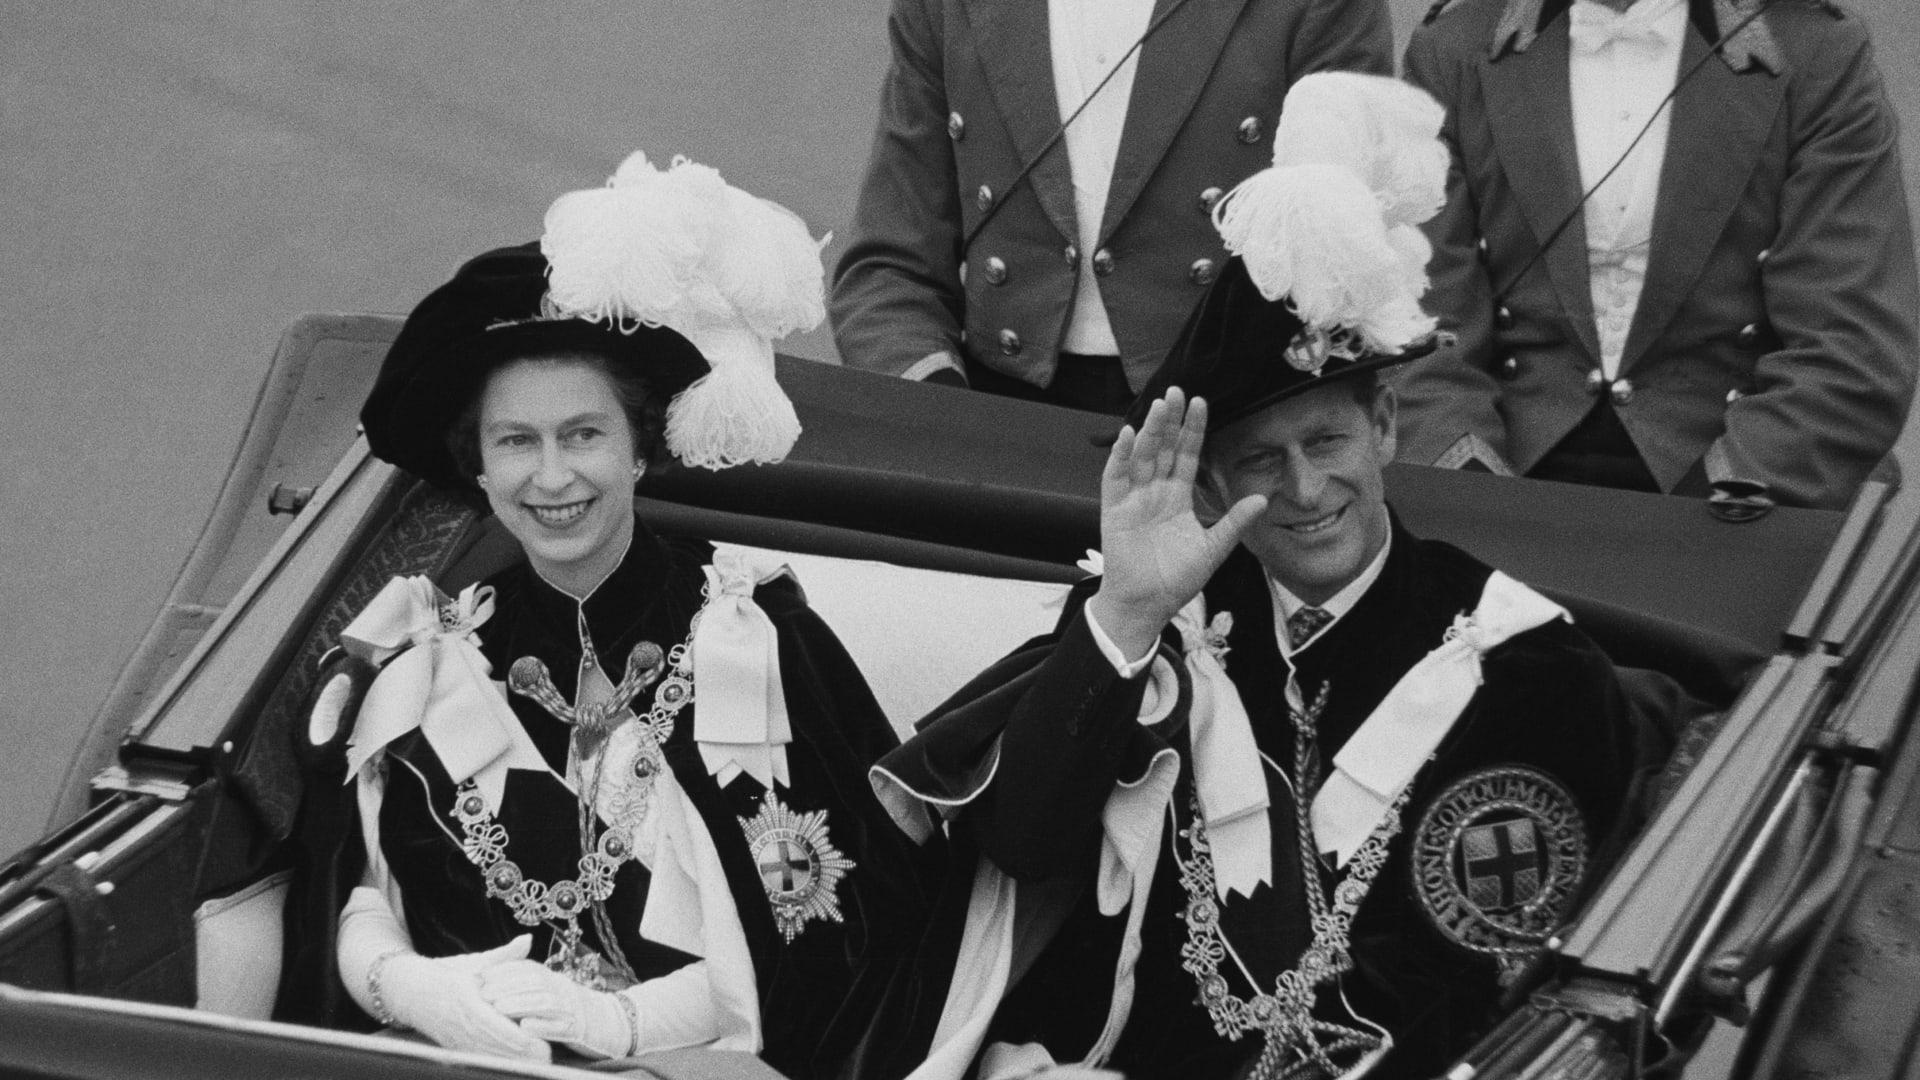 Prince Philip, Duke of Edinburgh and Queen Elizabeth